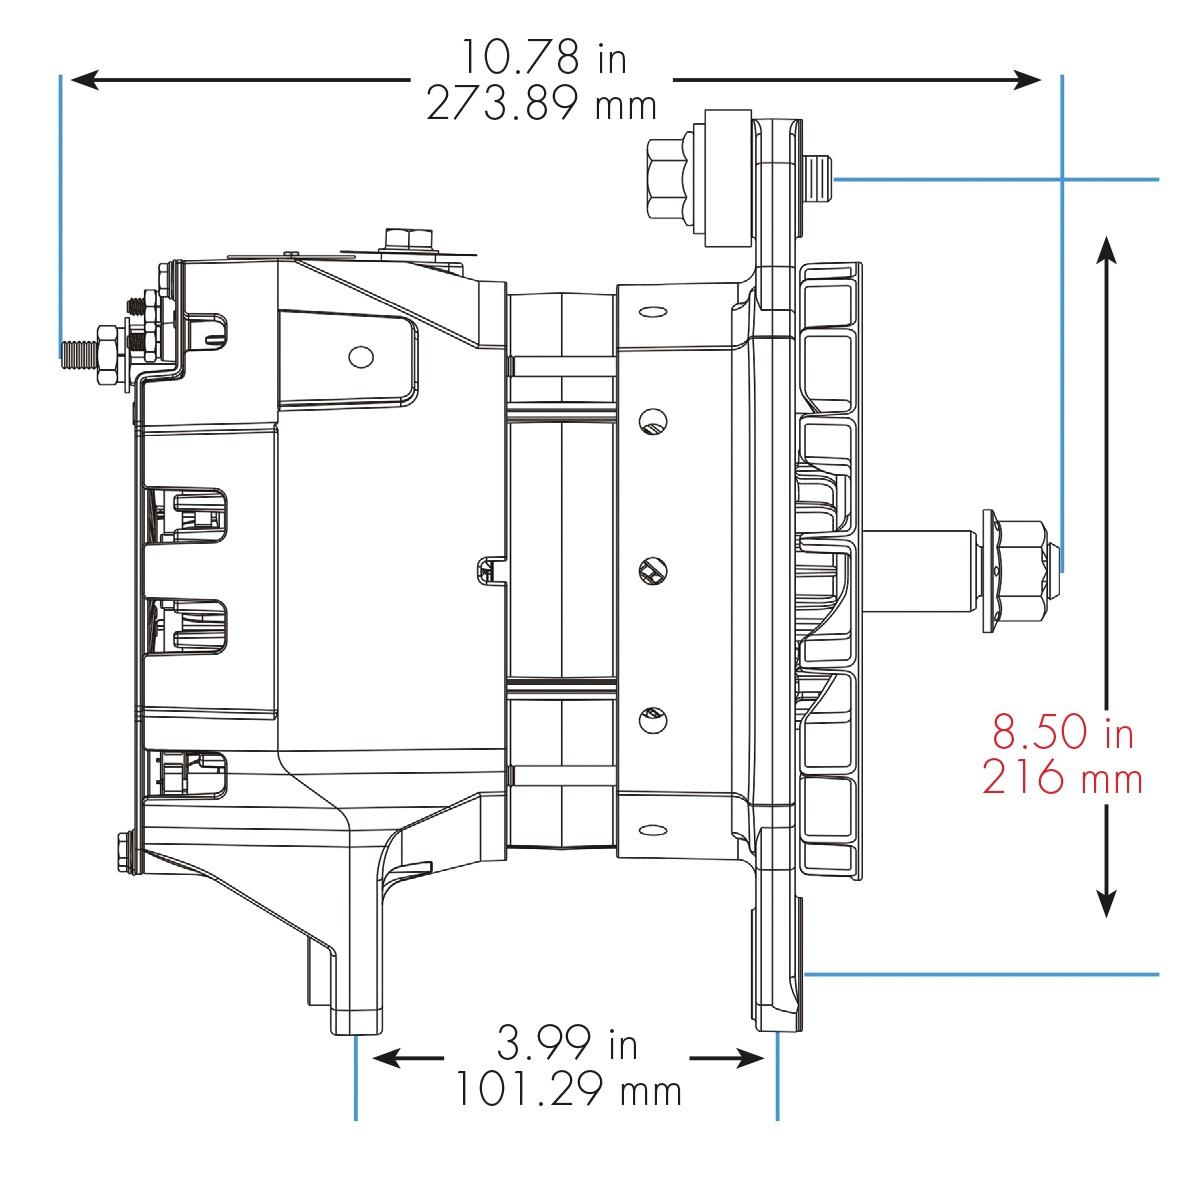 hight resolution of 22si alternator wiring diagram identify diagram alternator wiringdelco remy si alternator wiring diagram wiring diagram alternators